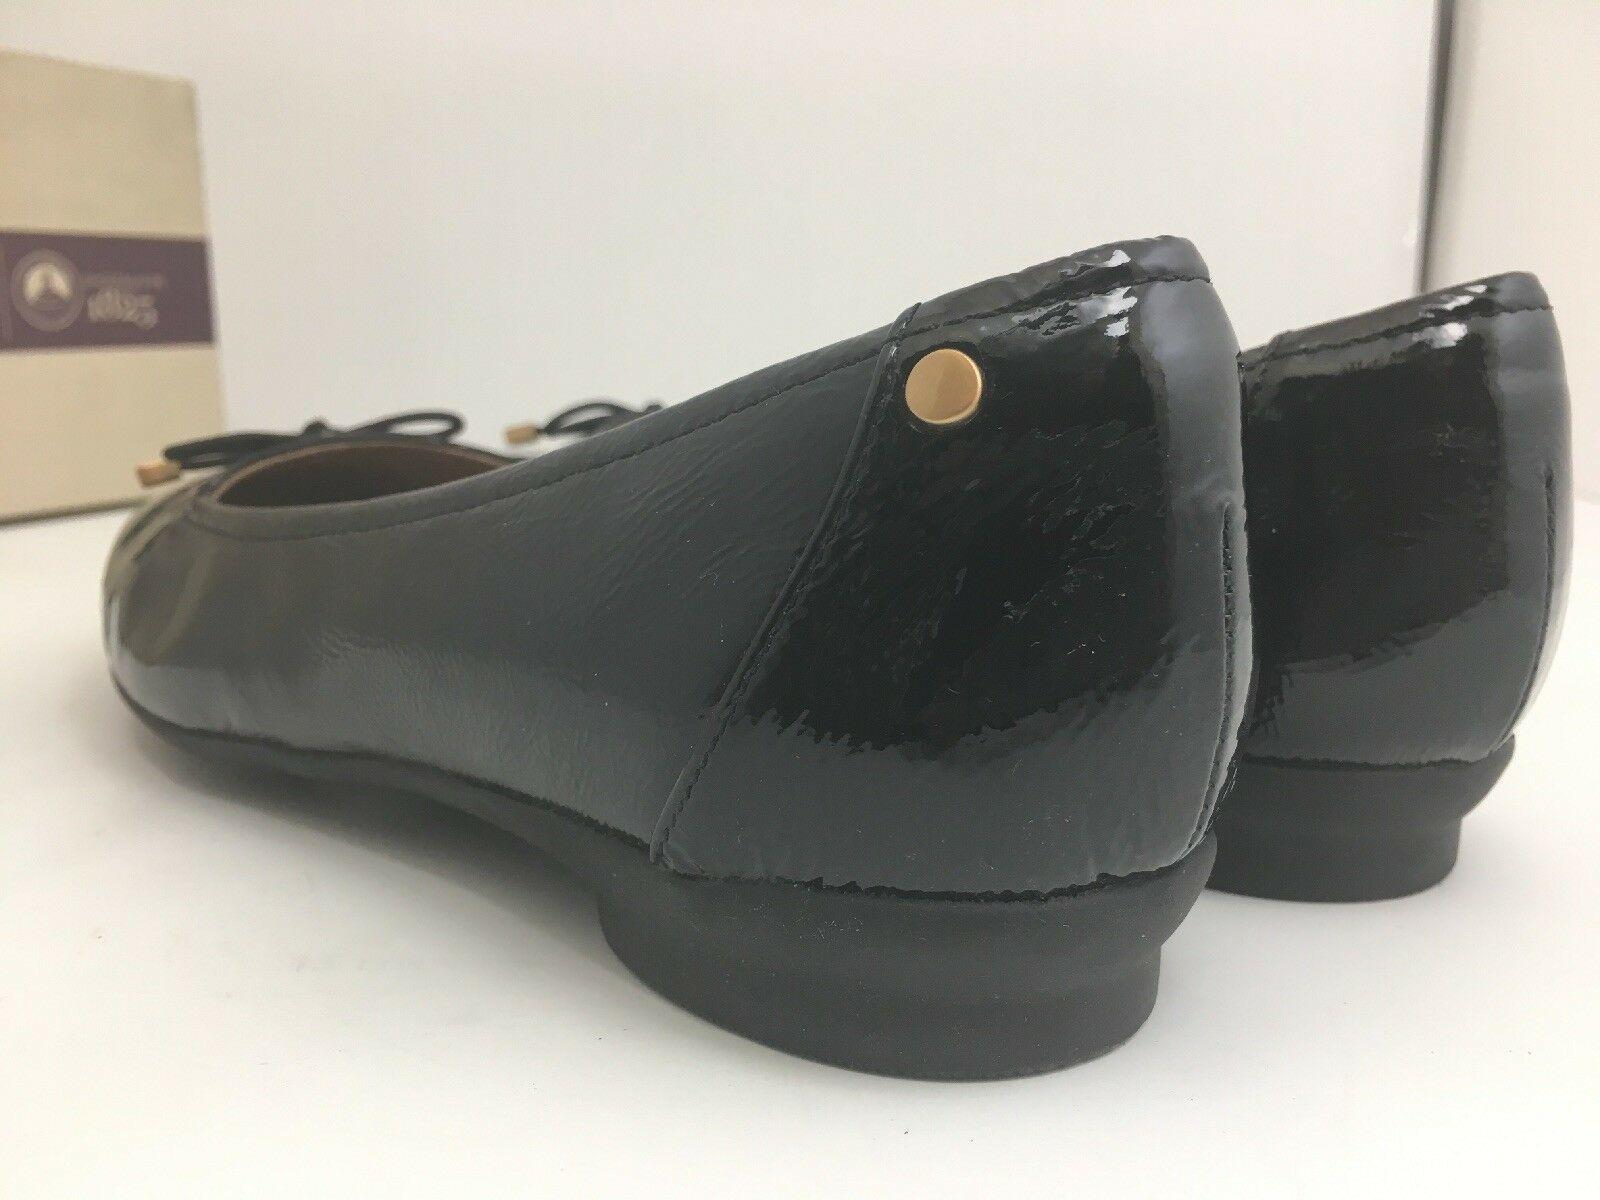 Clarks Artisan Candra Light Women S Black Patent Leather